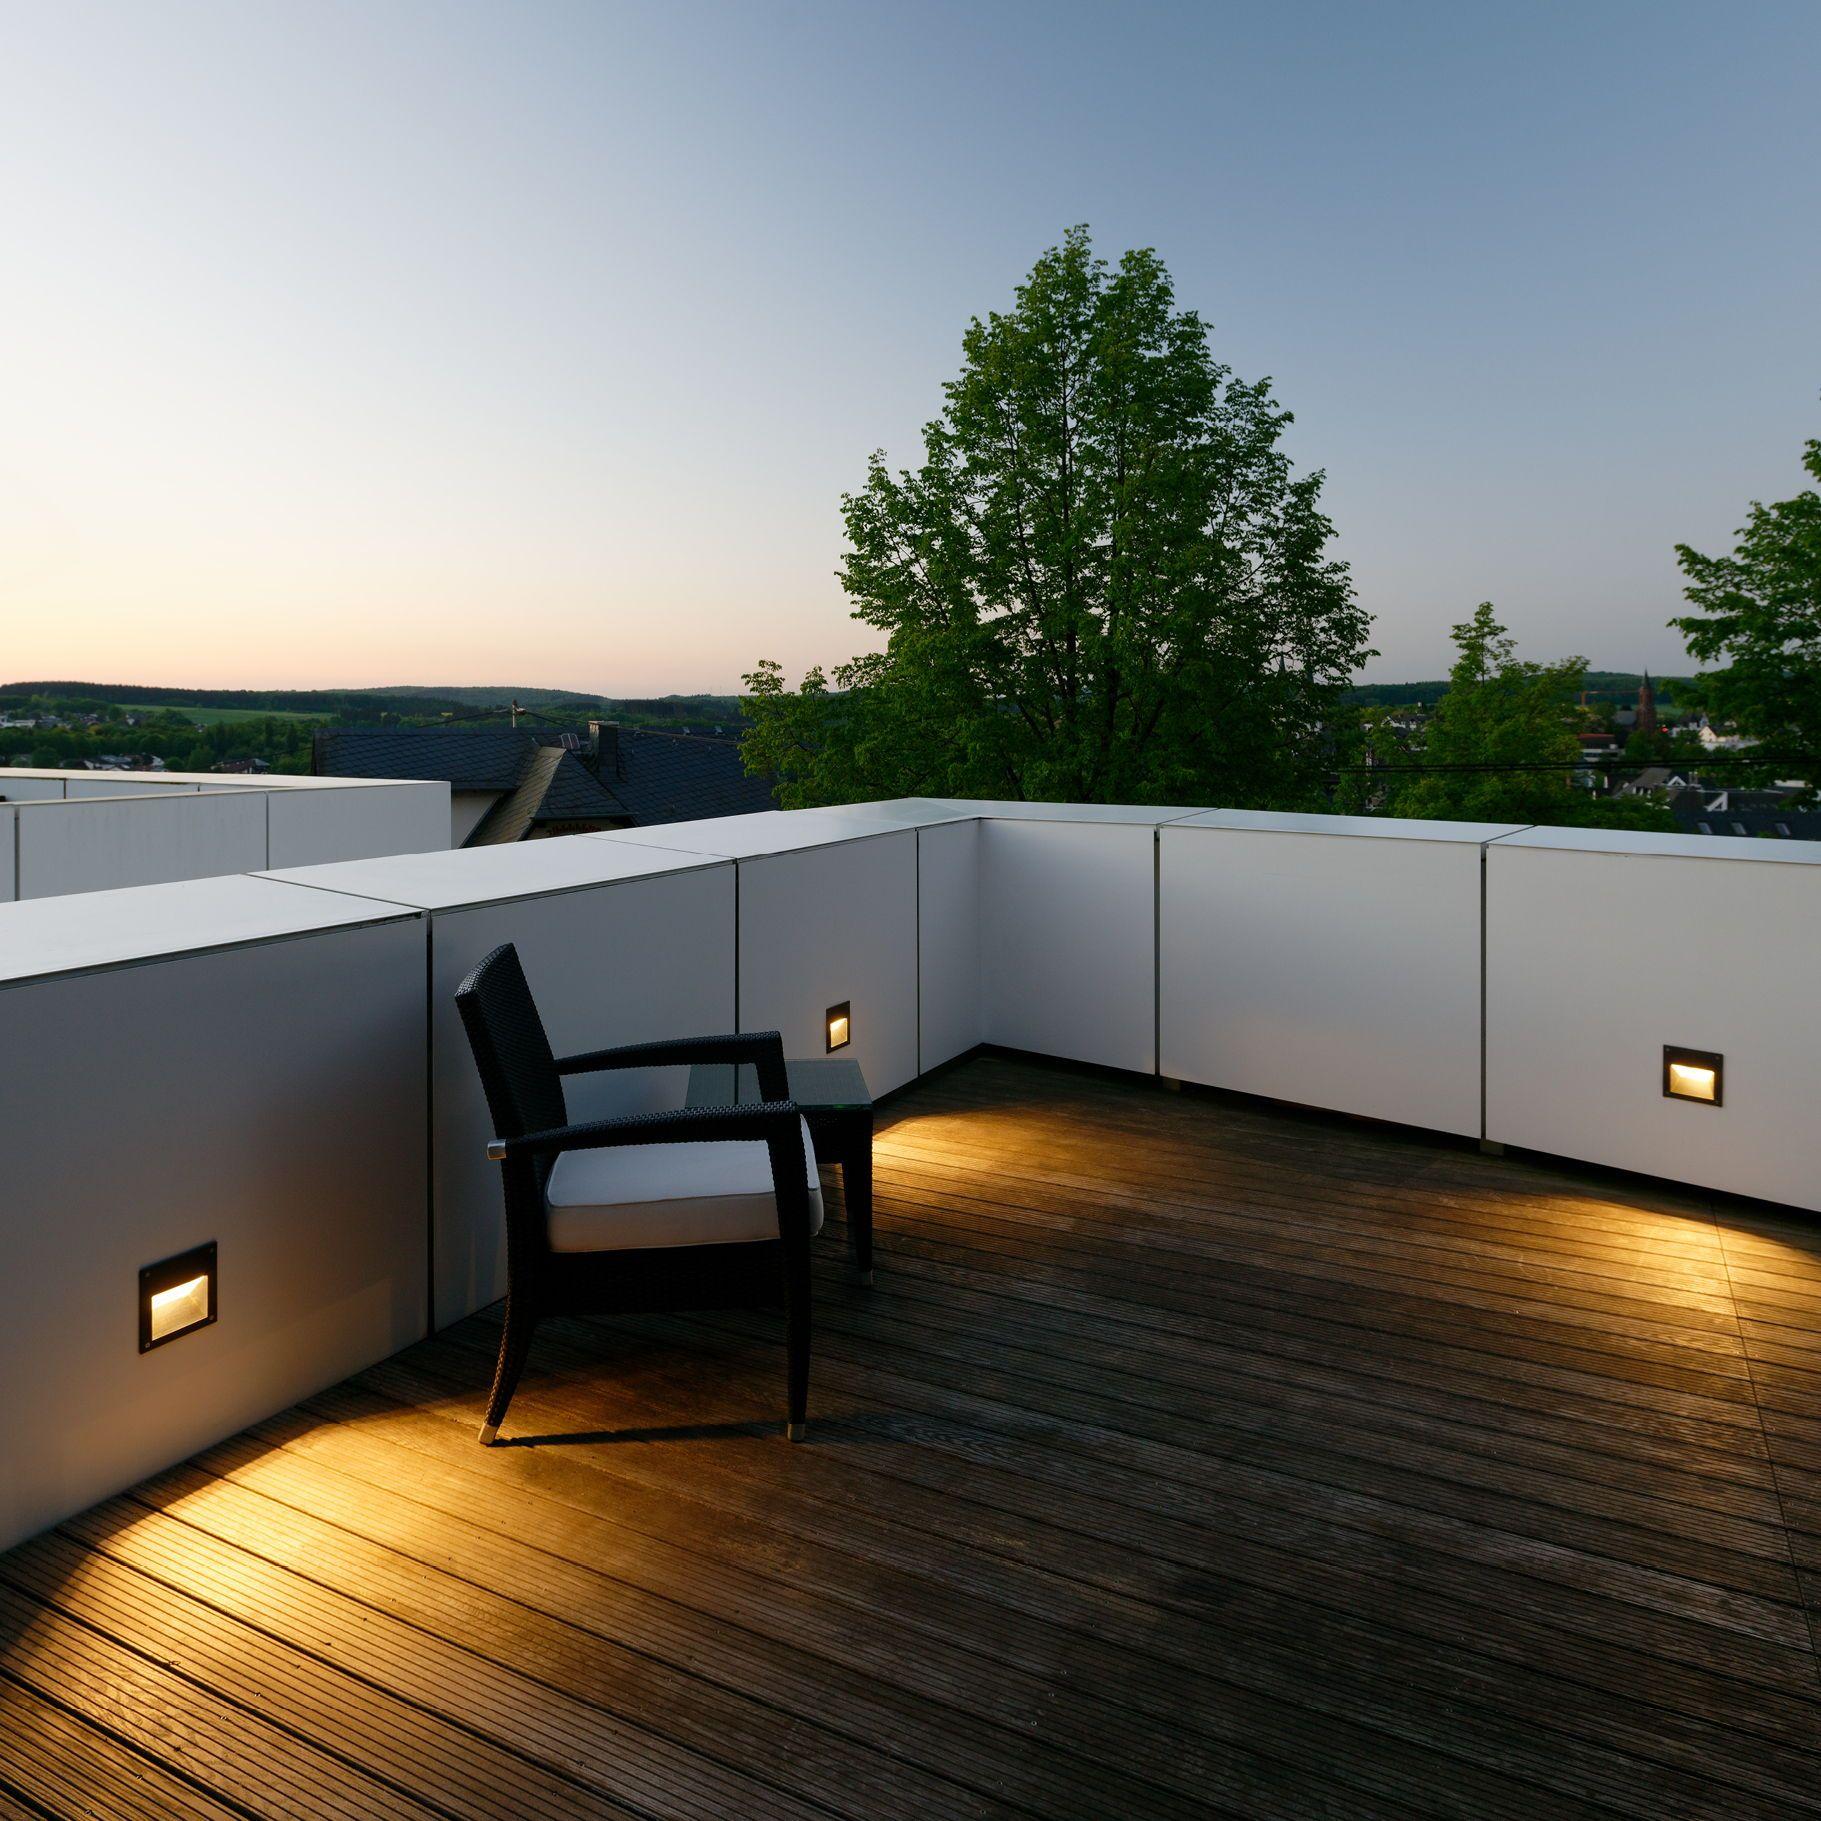 Bega Recessed Wall Luminaires Bega Outdoor Walls Floor Lights